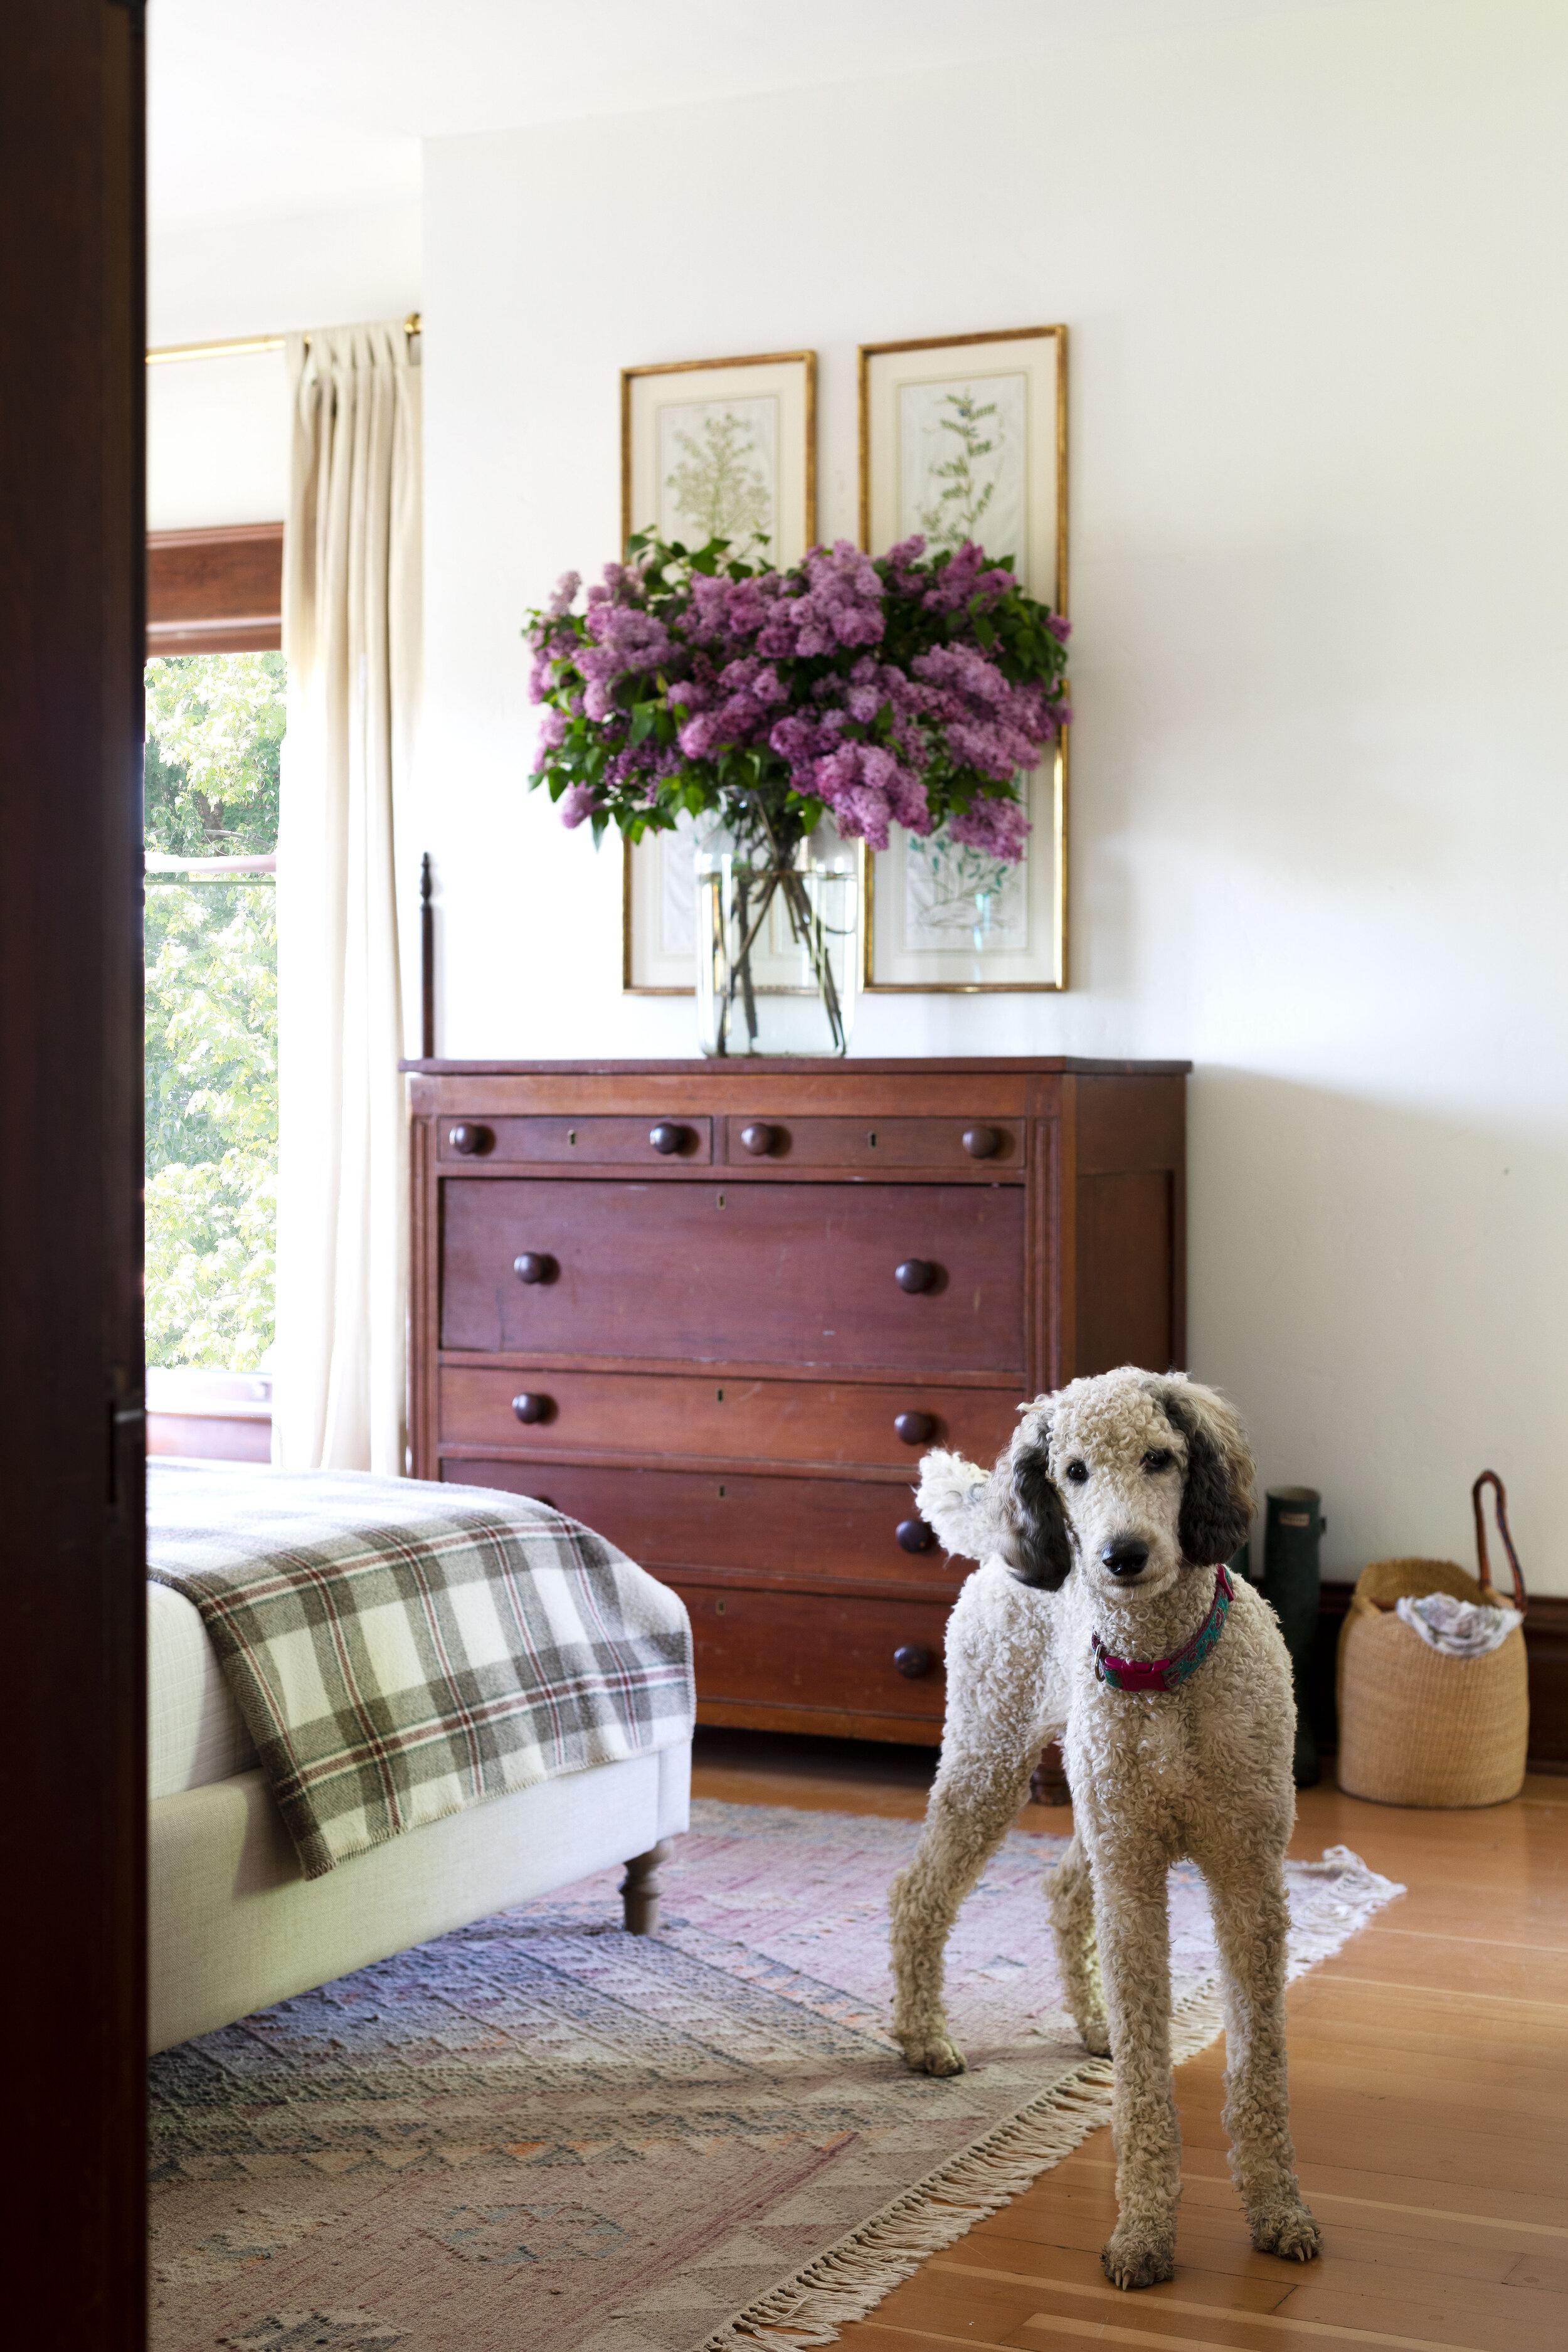 The-Grit-and-Polish---Farmhouse-Bedroom-Lilac-Arrangement-10.jpg